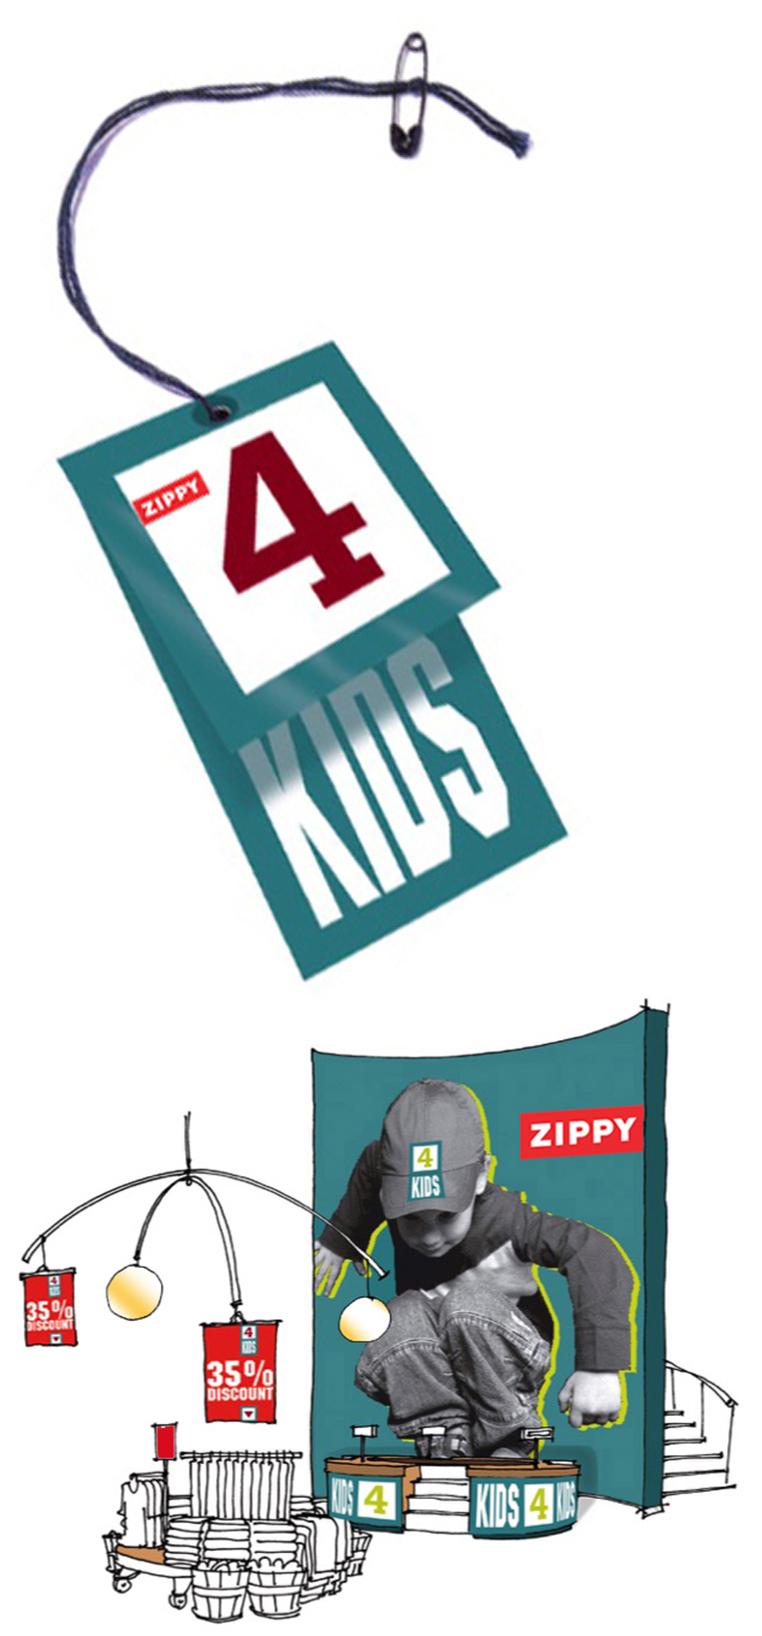 ZIPPY kidstore concept